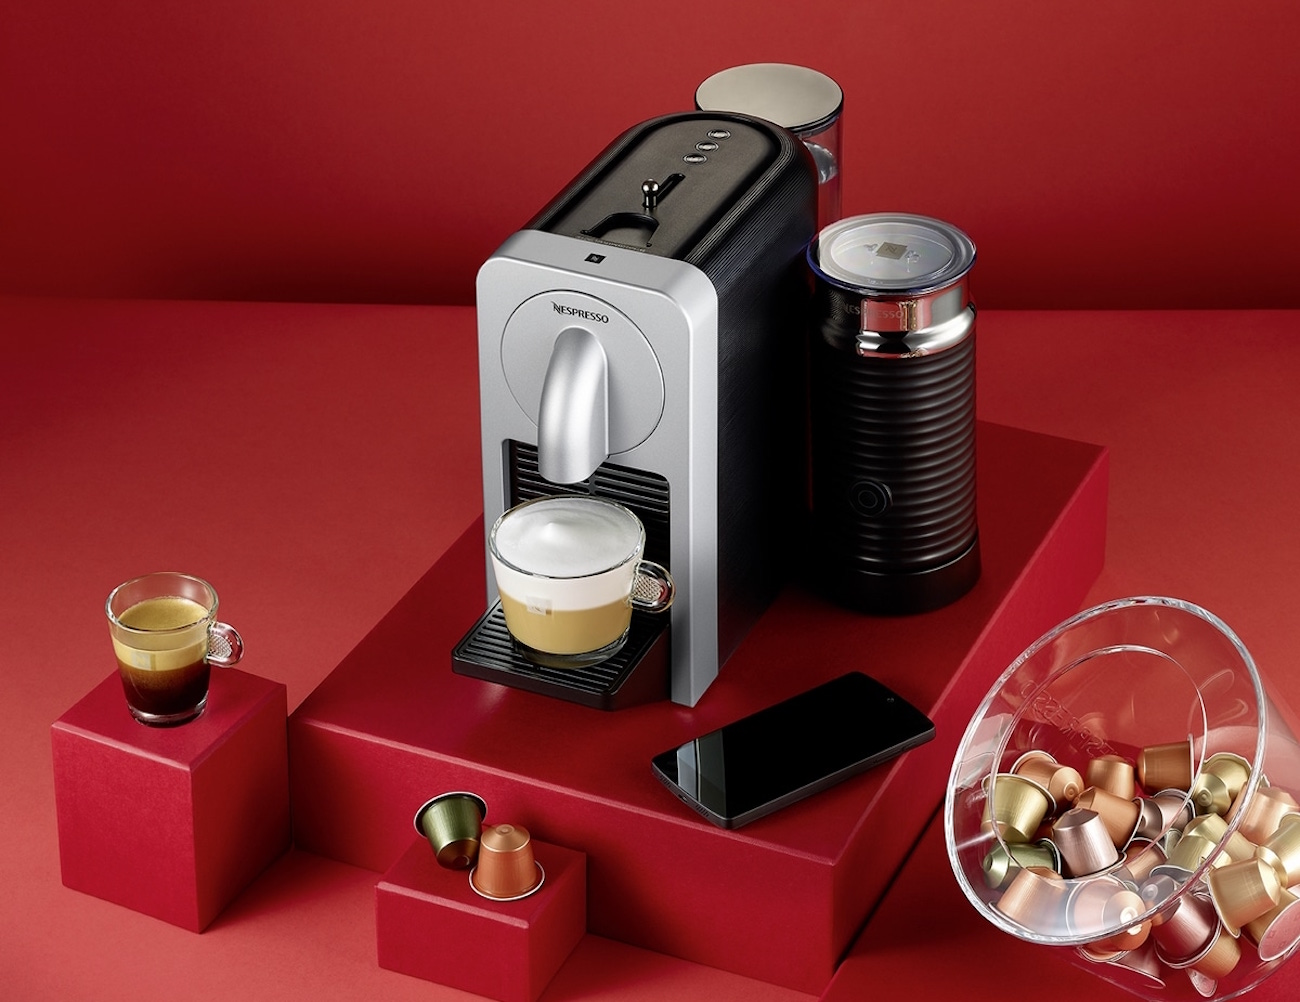 Nespresso Prodigo Smart Espresso Machine